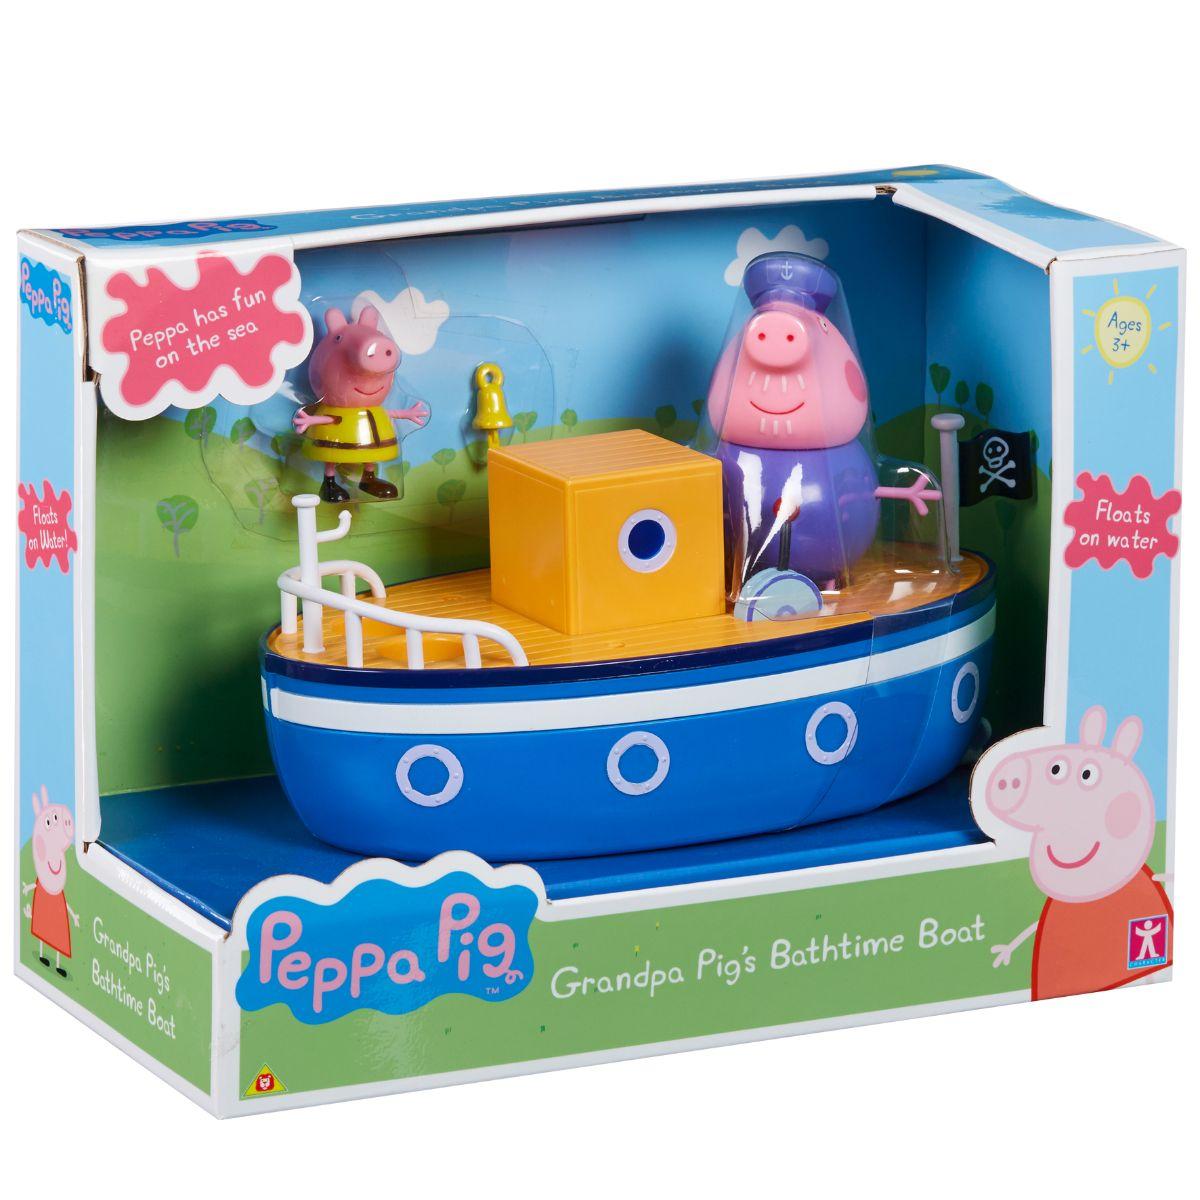 Barca, Peppa Pig, Grandpa Pig's Bathtime Boat